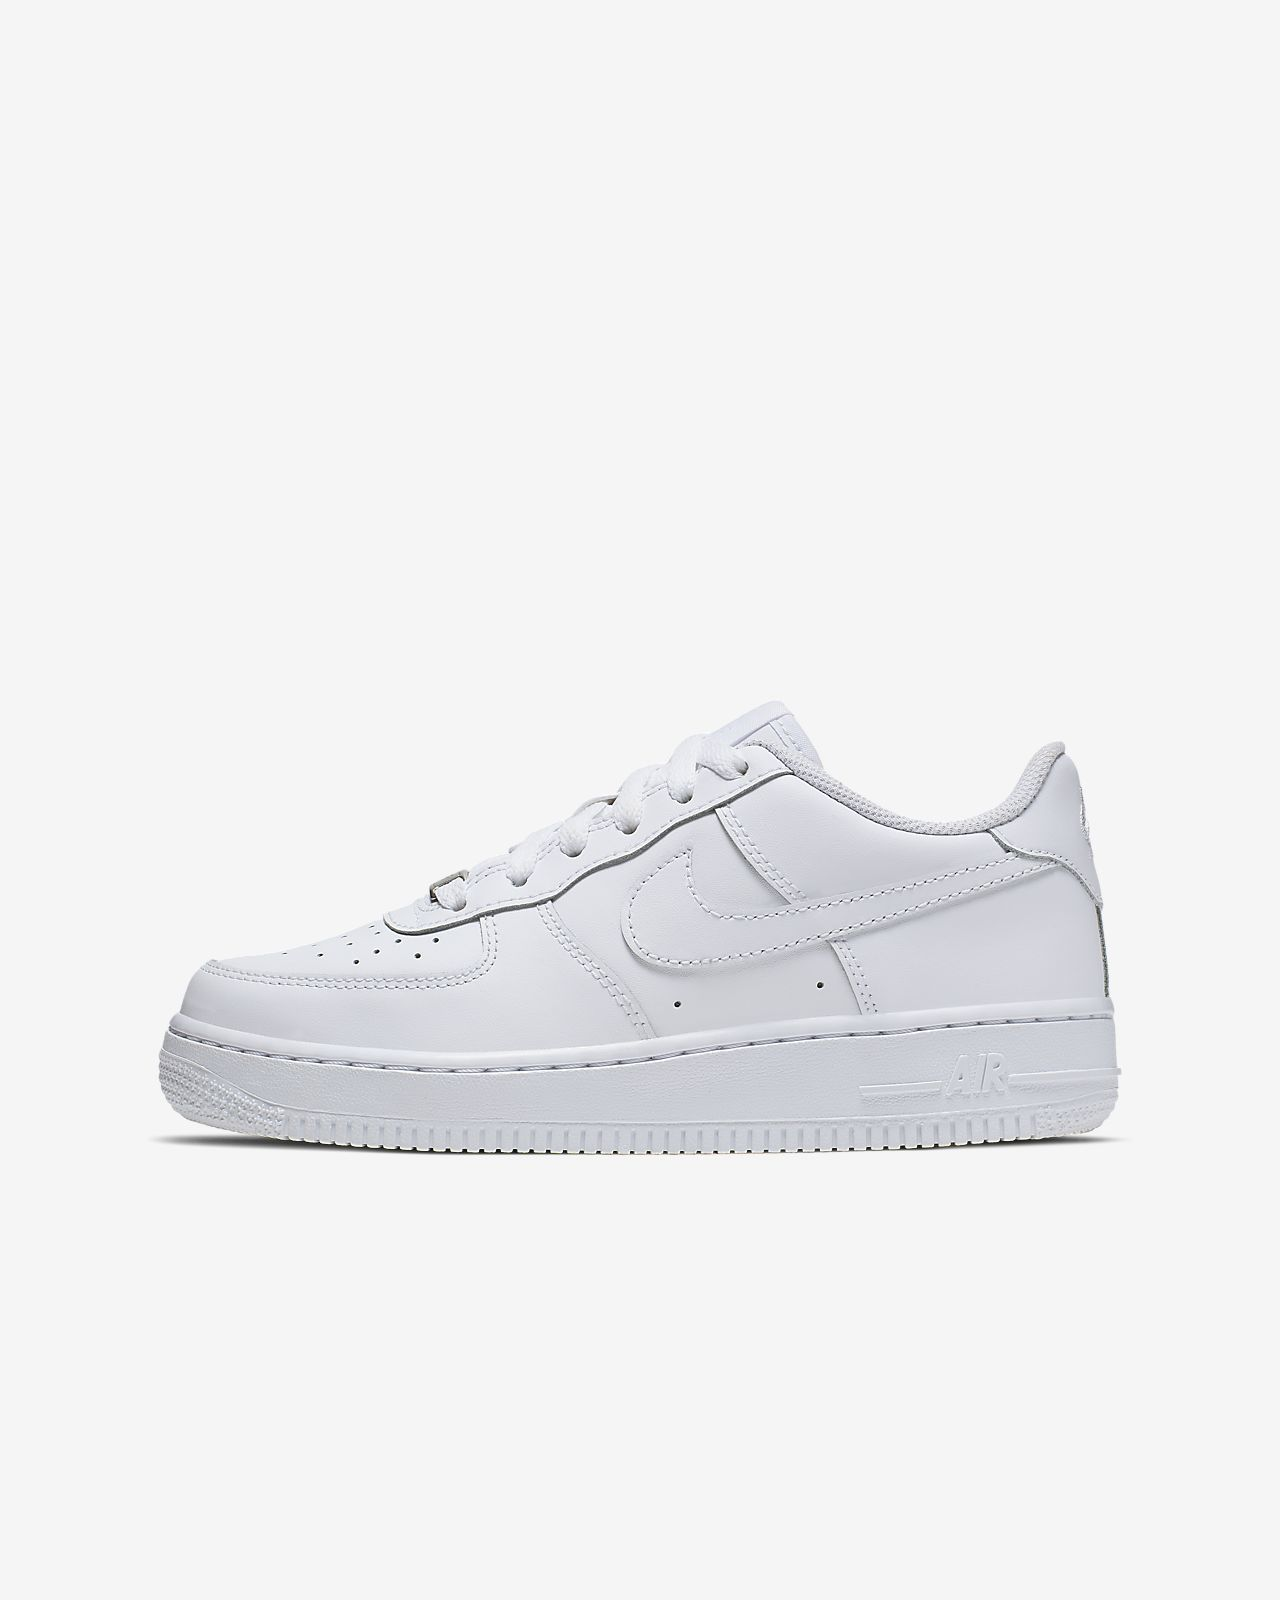 Nike Air Force 1 Triple White Schuh für ältere Kinder